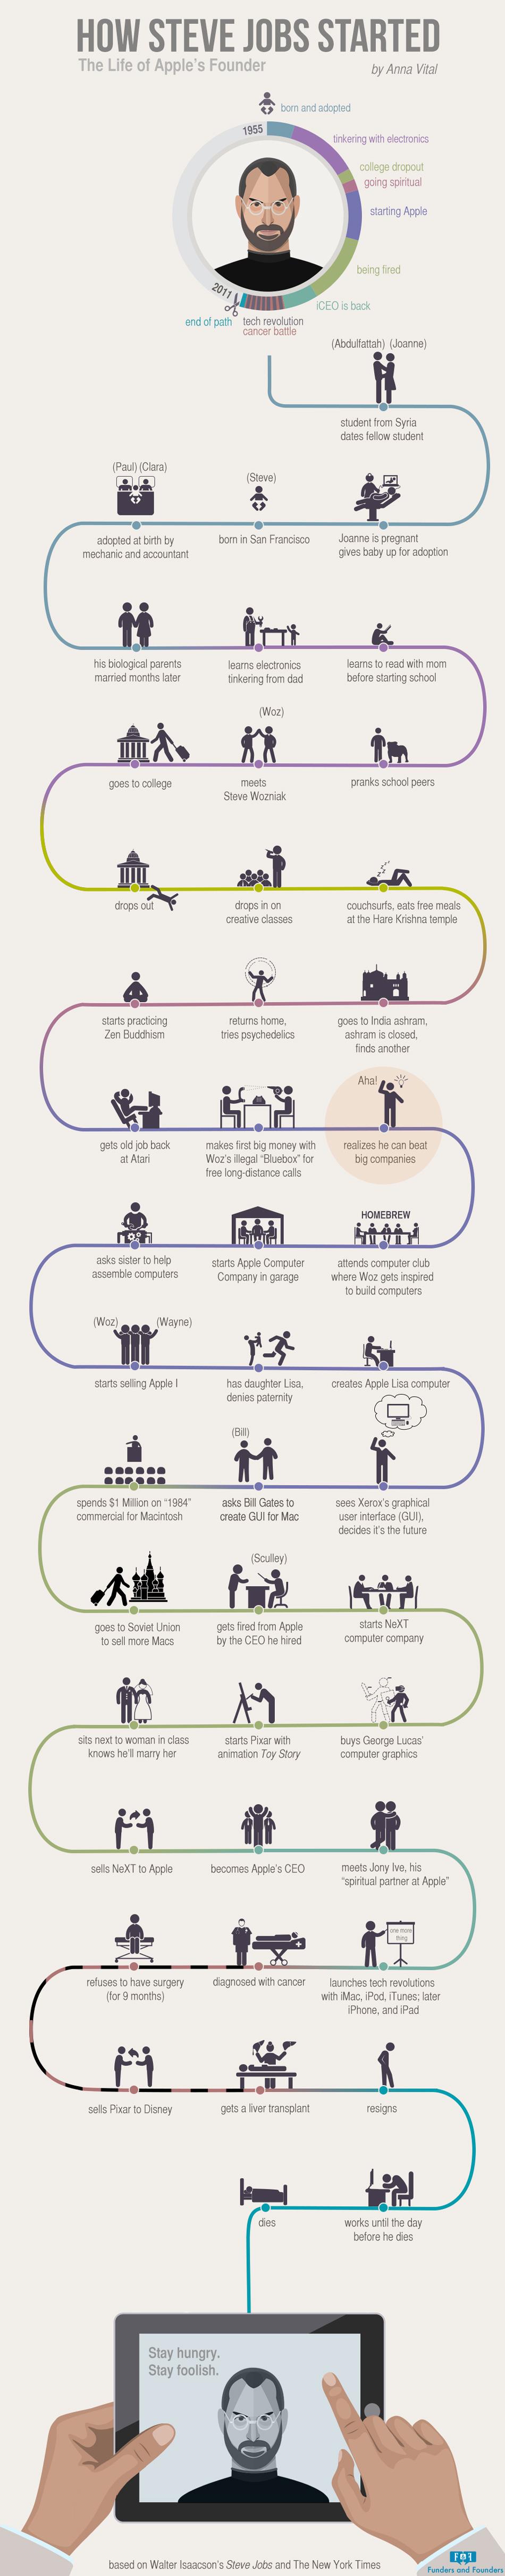 Infográfico sobre a trajetória de Steve Jobs